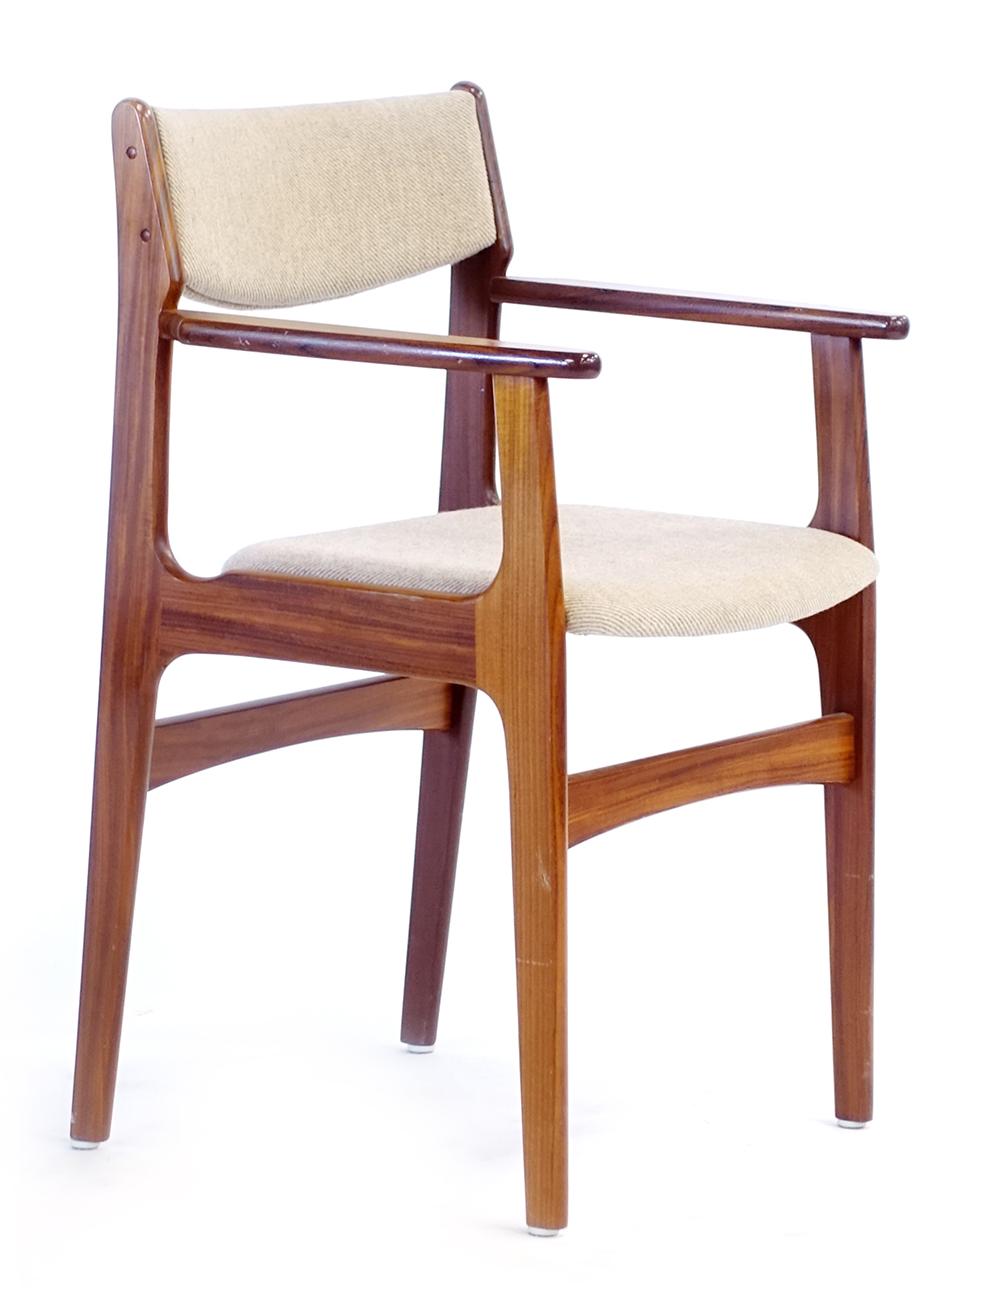 Lot 2 - A Danish teak and upholstered Model 404 elbow chair designed by Arne Vodder